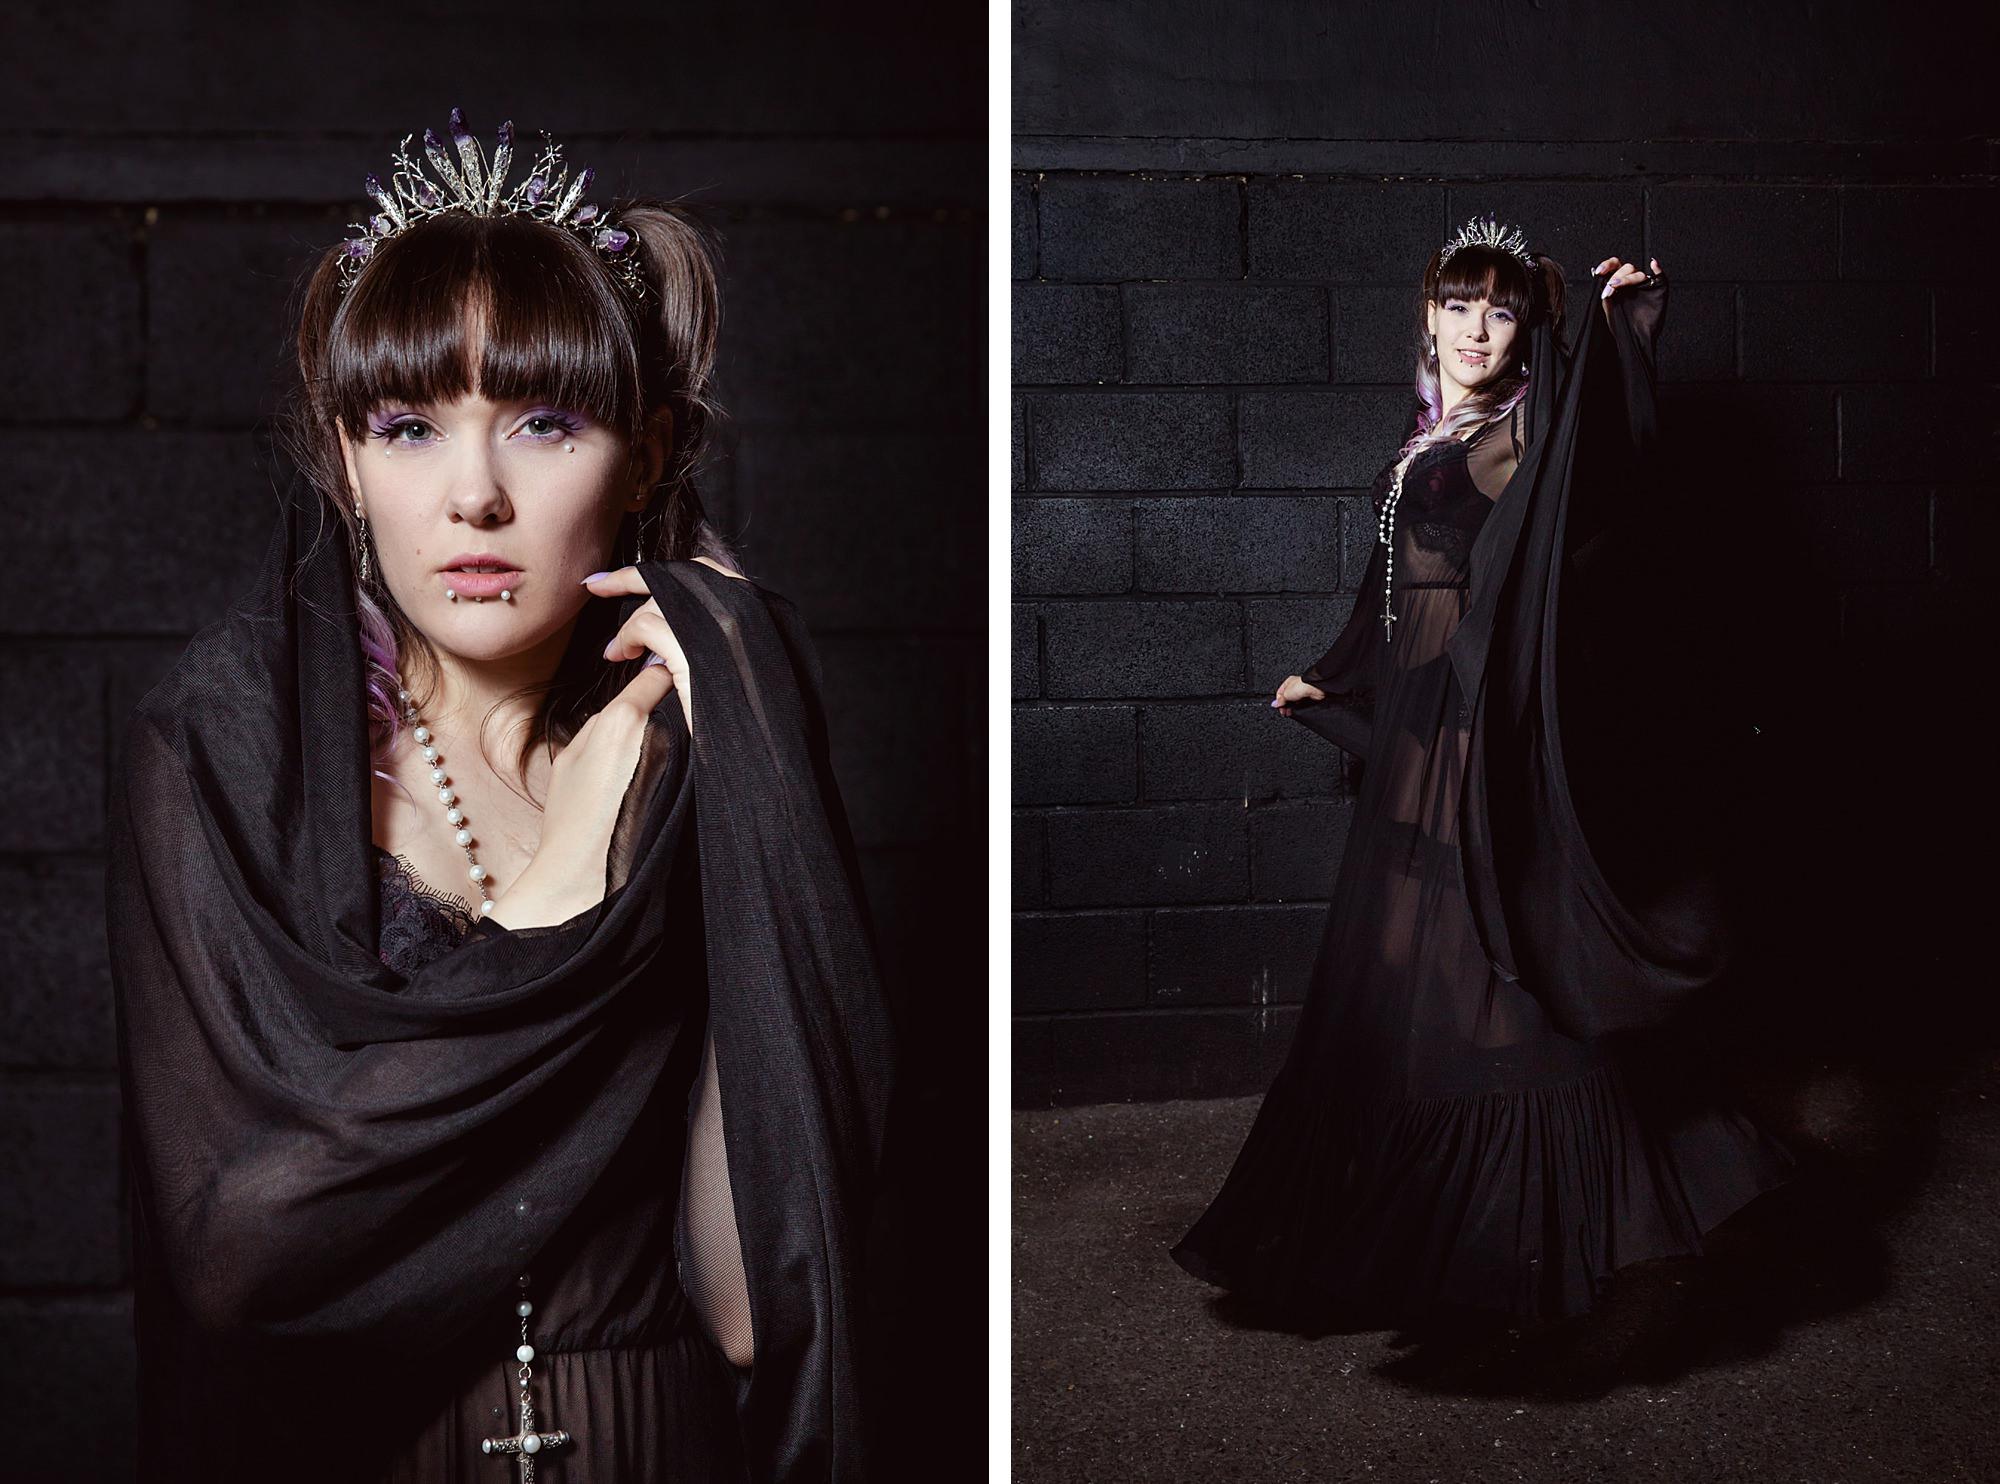 Gothic wedding London portrait of bride wearing amethyst crown